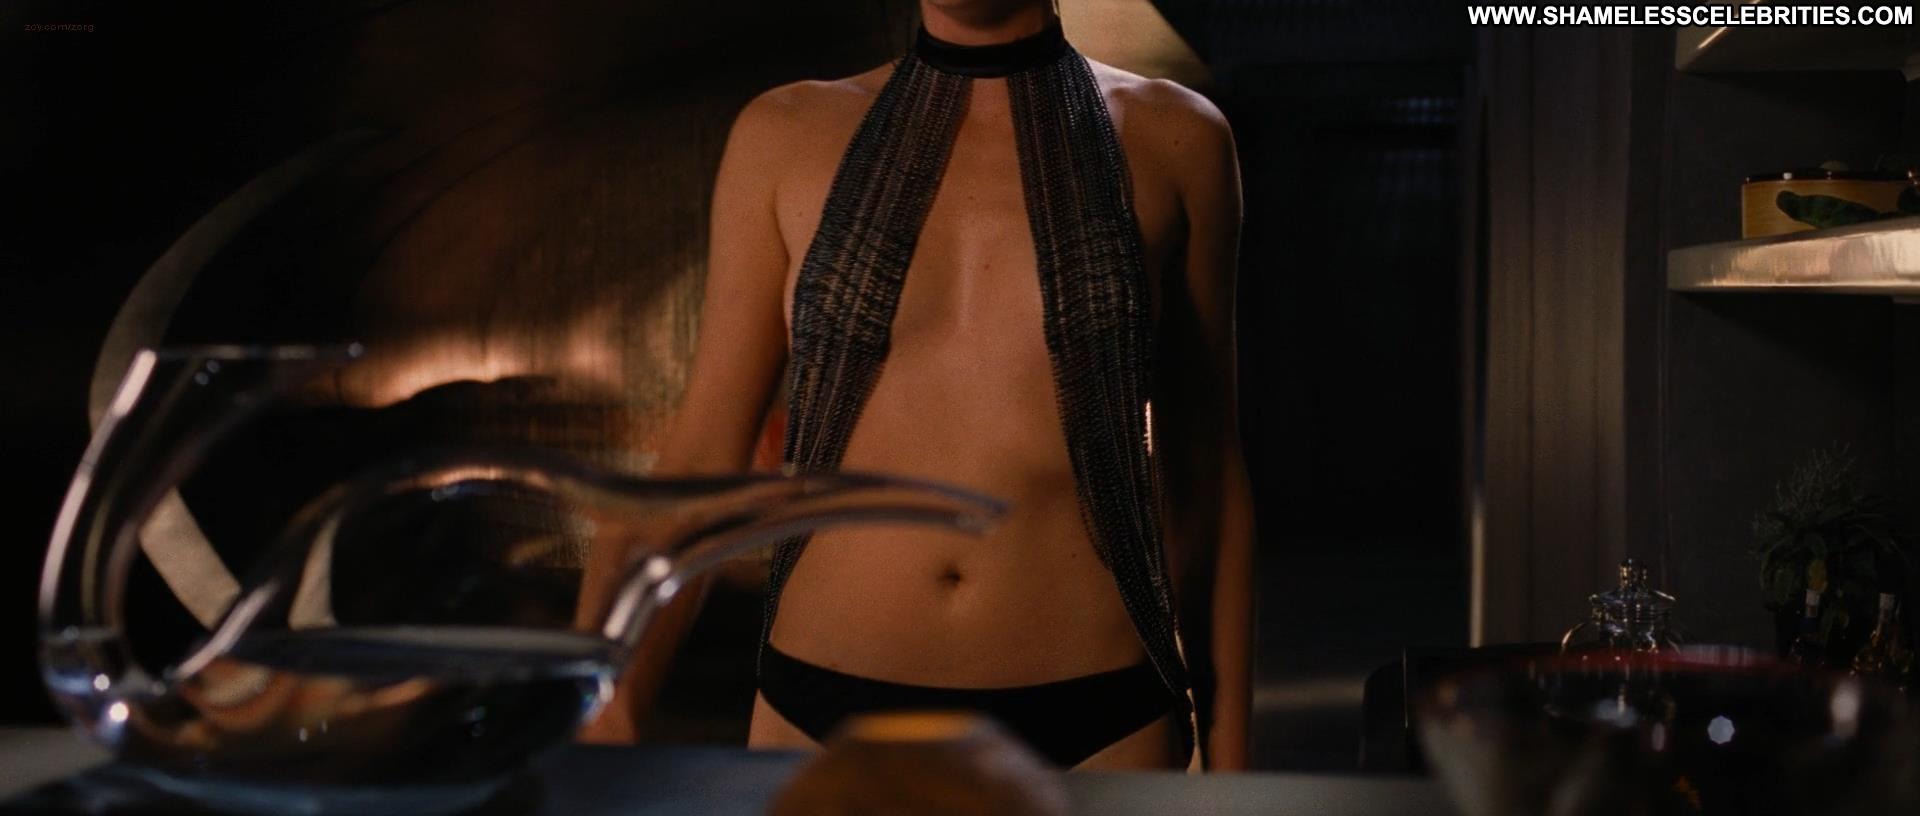 aeon-flux-naked